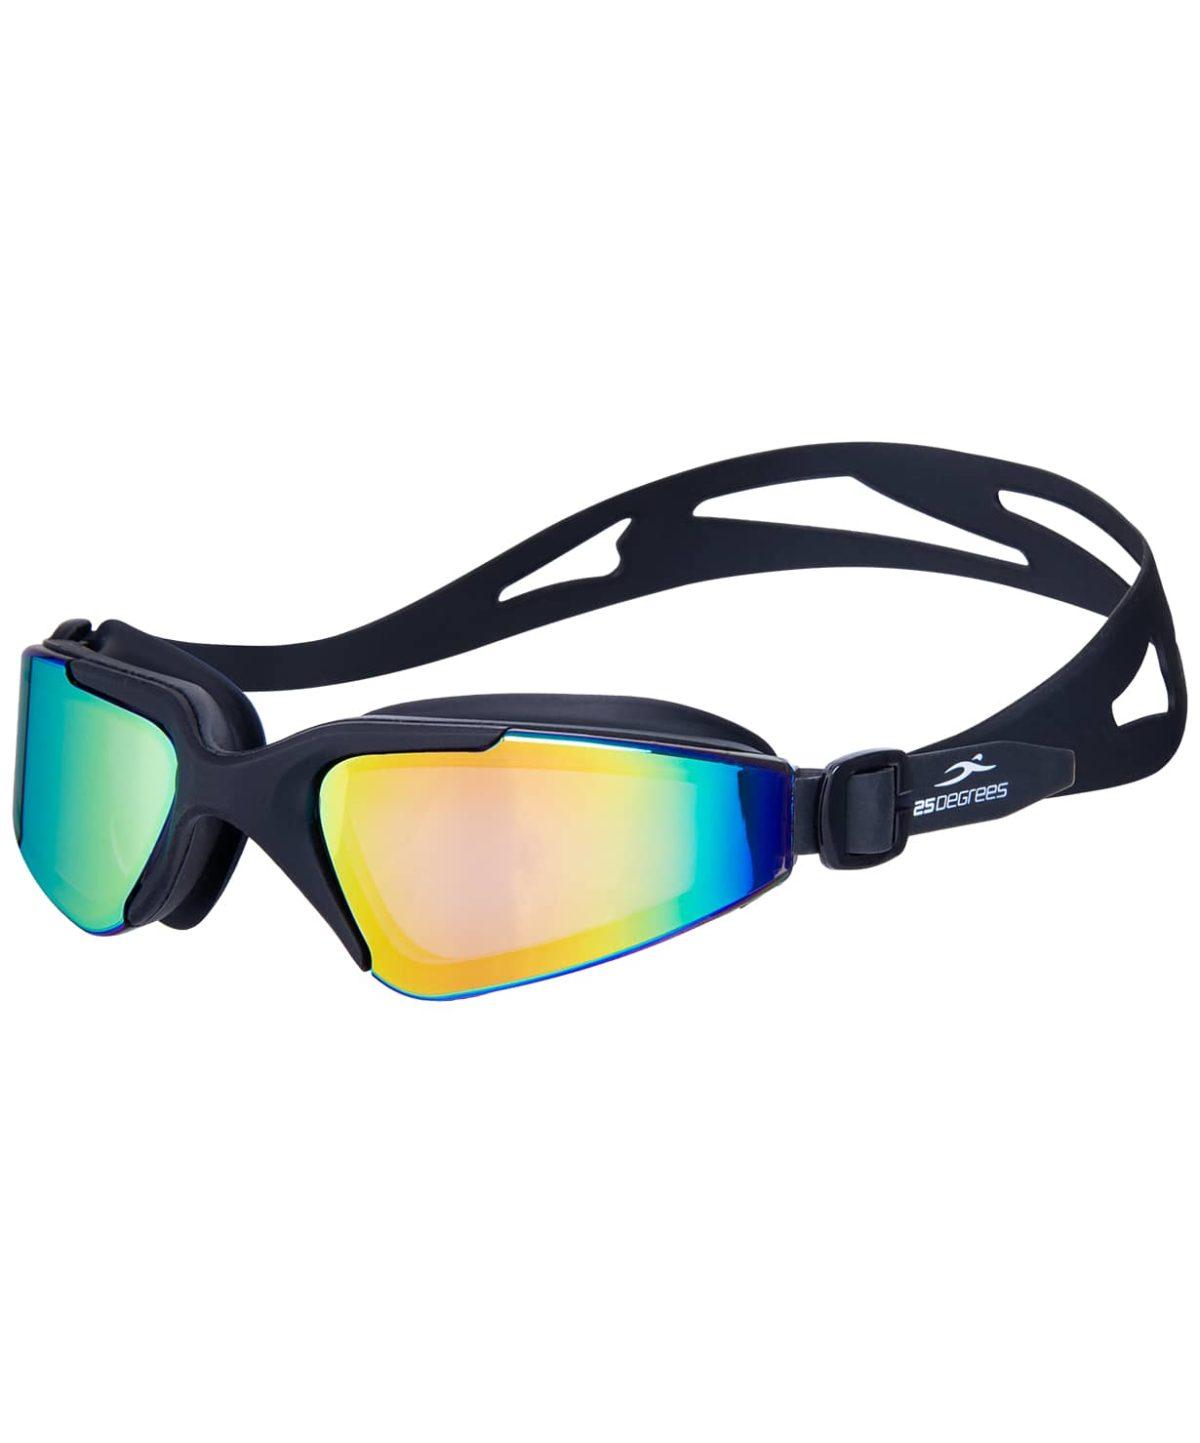 25DEGREES Prisma Mirrored Black Очки для плавания подростковые  17341 - 1